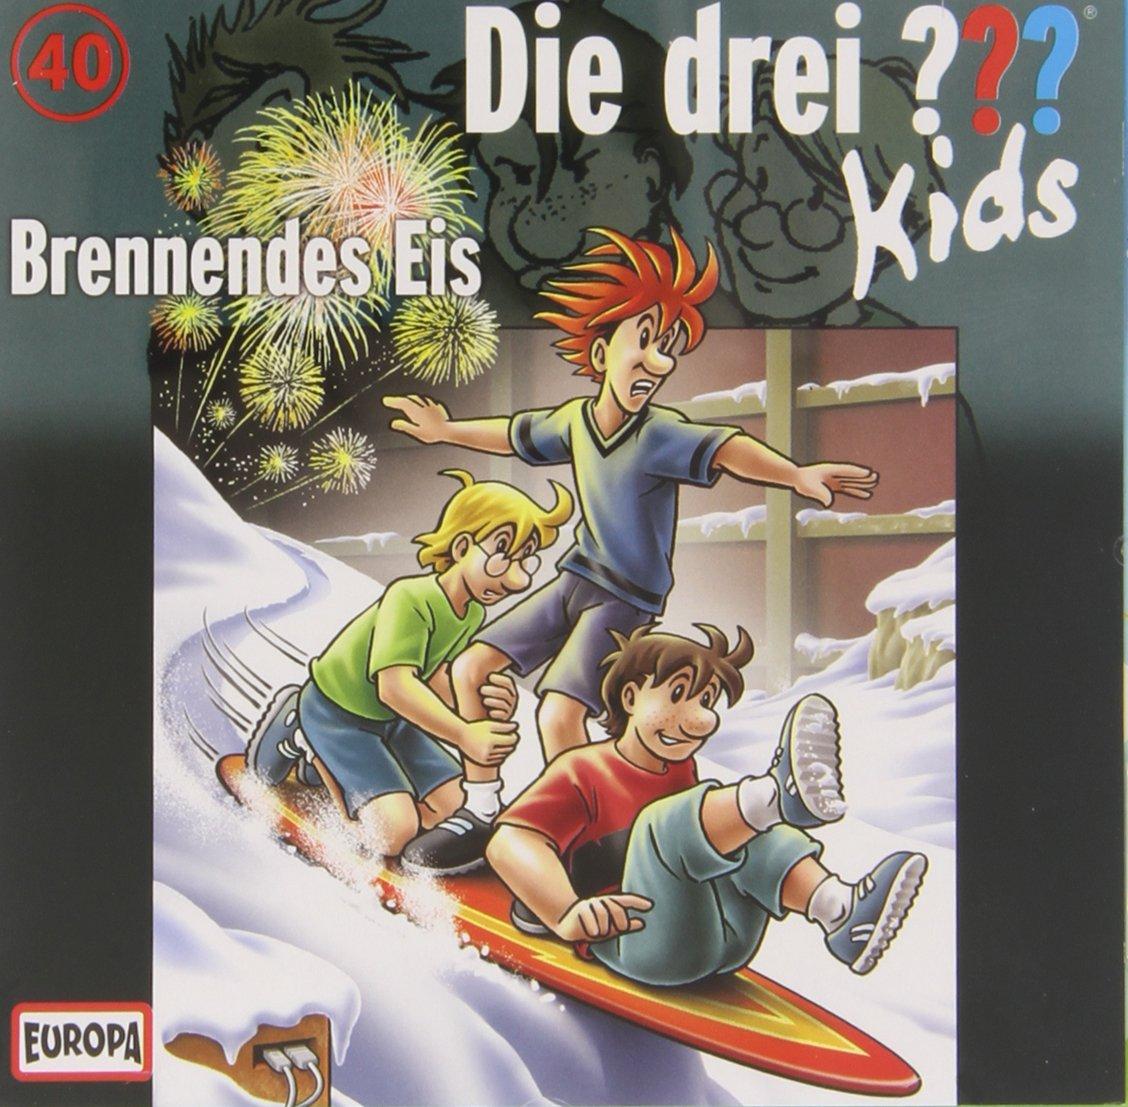 Die drei ??? Kids - Brennendes Eis (Folge 40)